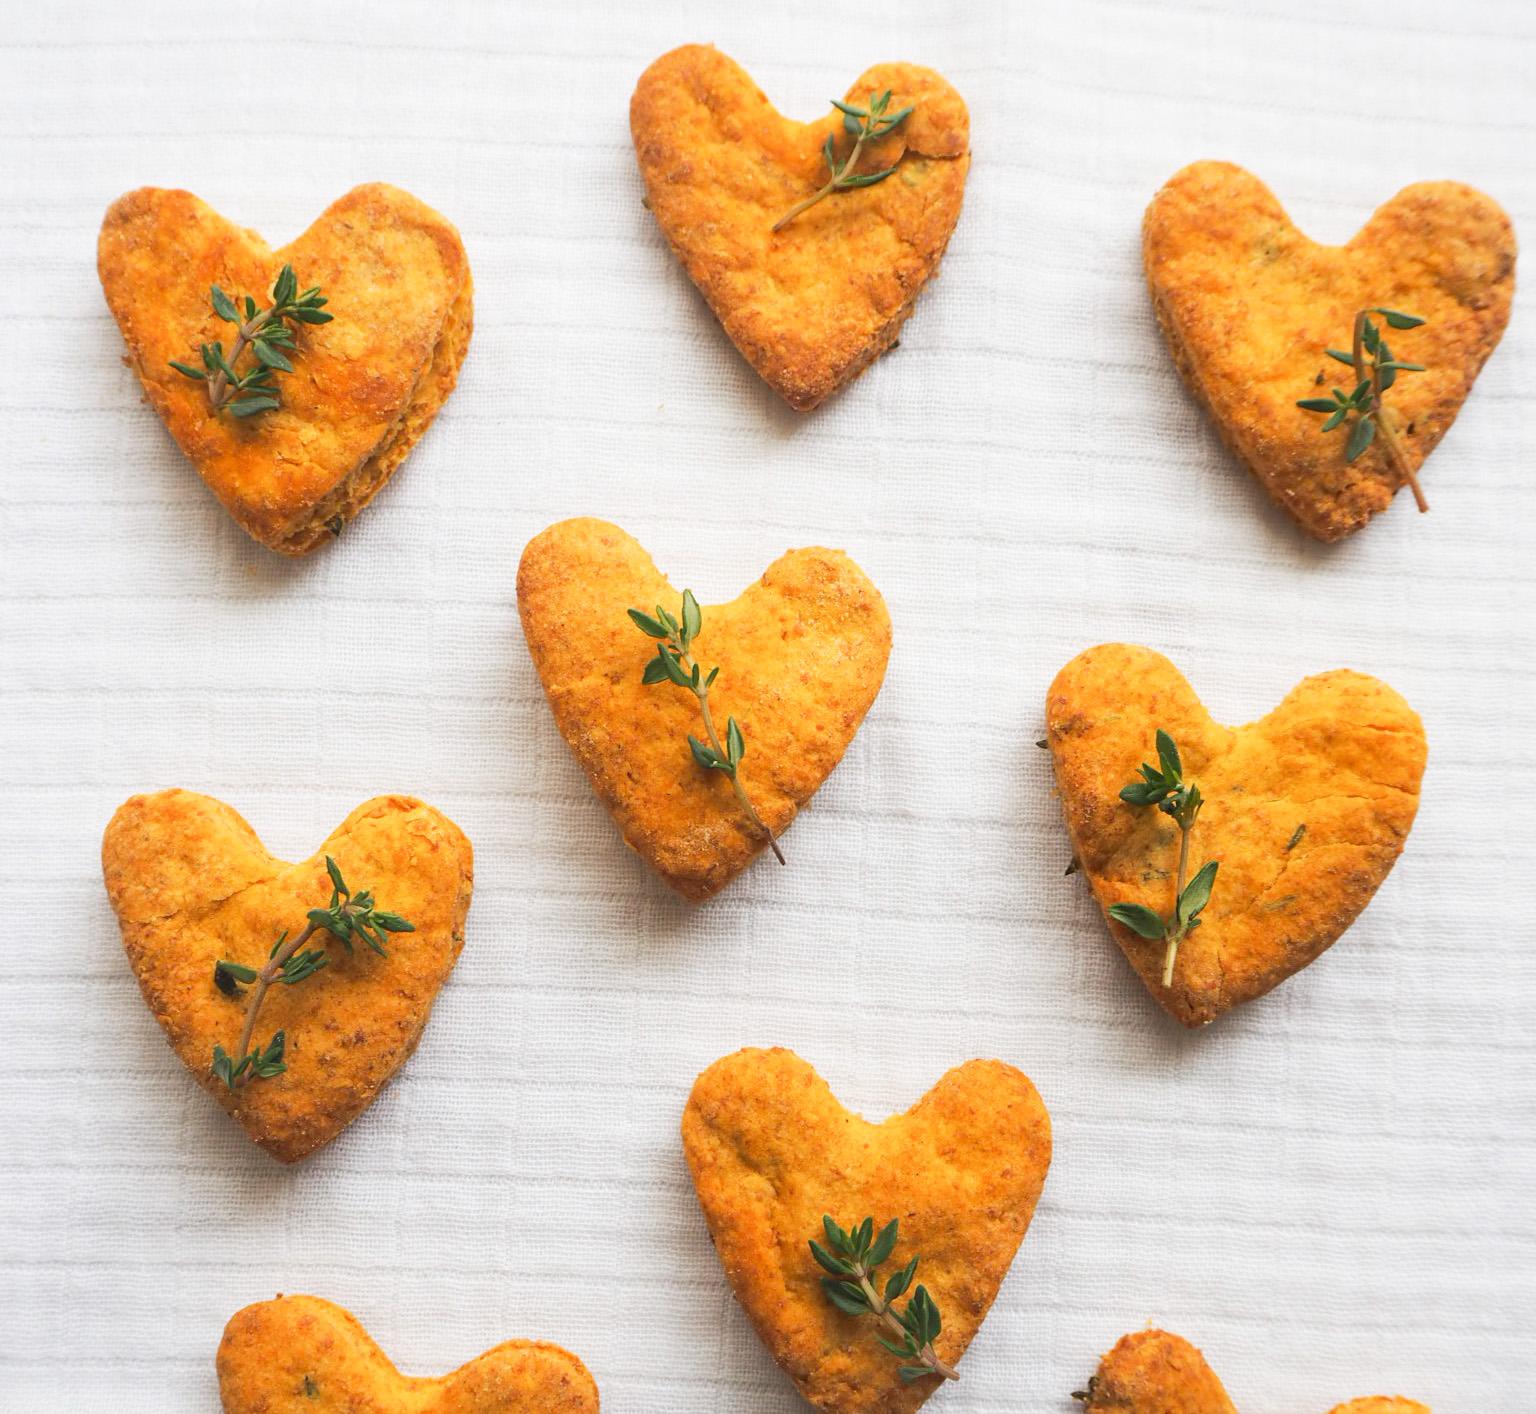 carrotbiscuitsplainpatternhearts.jpg